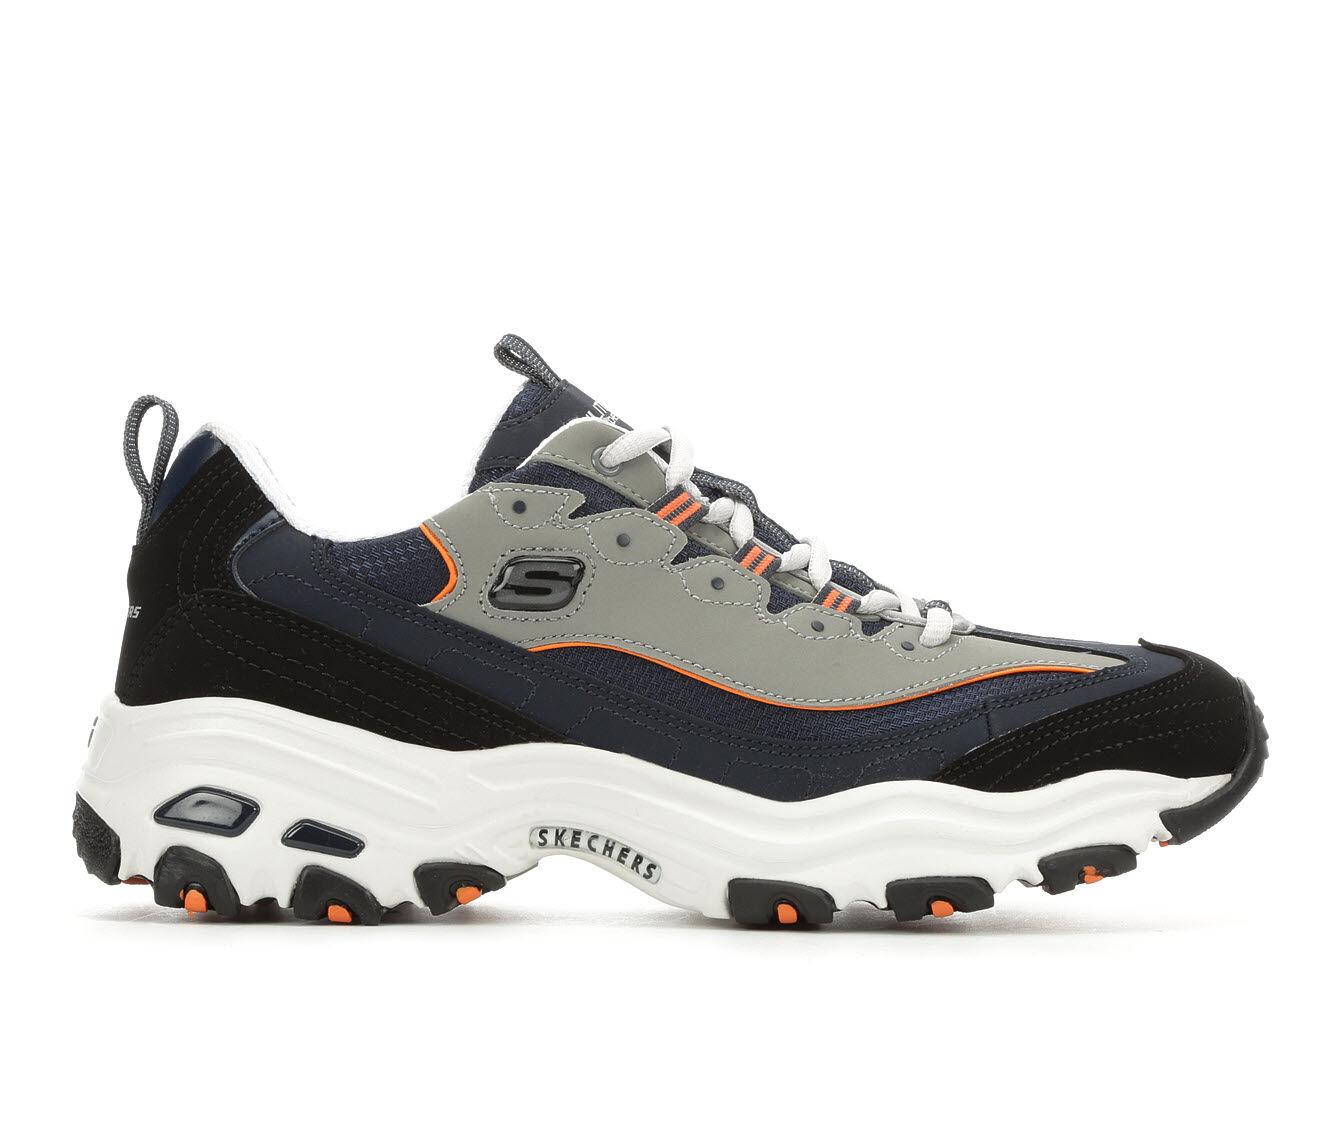 Men's Skechers D'Lites 52675 Sneakers Nvy/Wht/Gry/Org